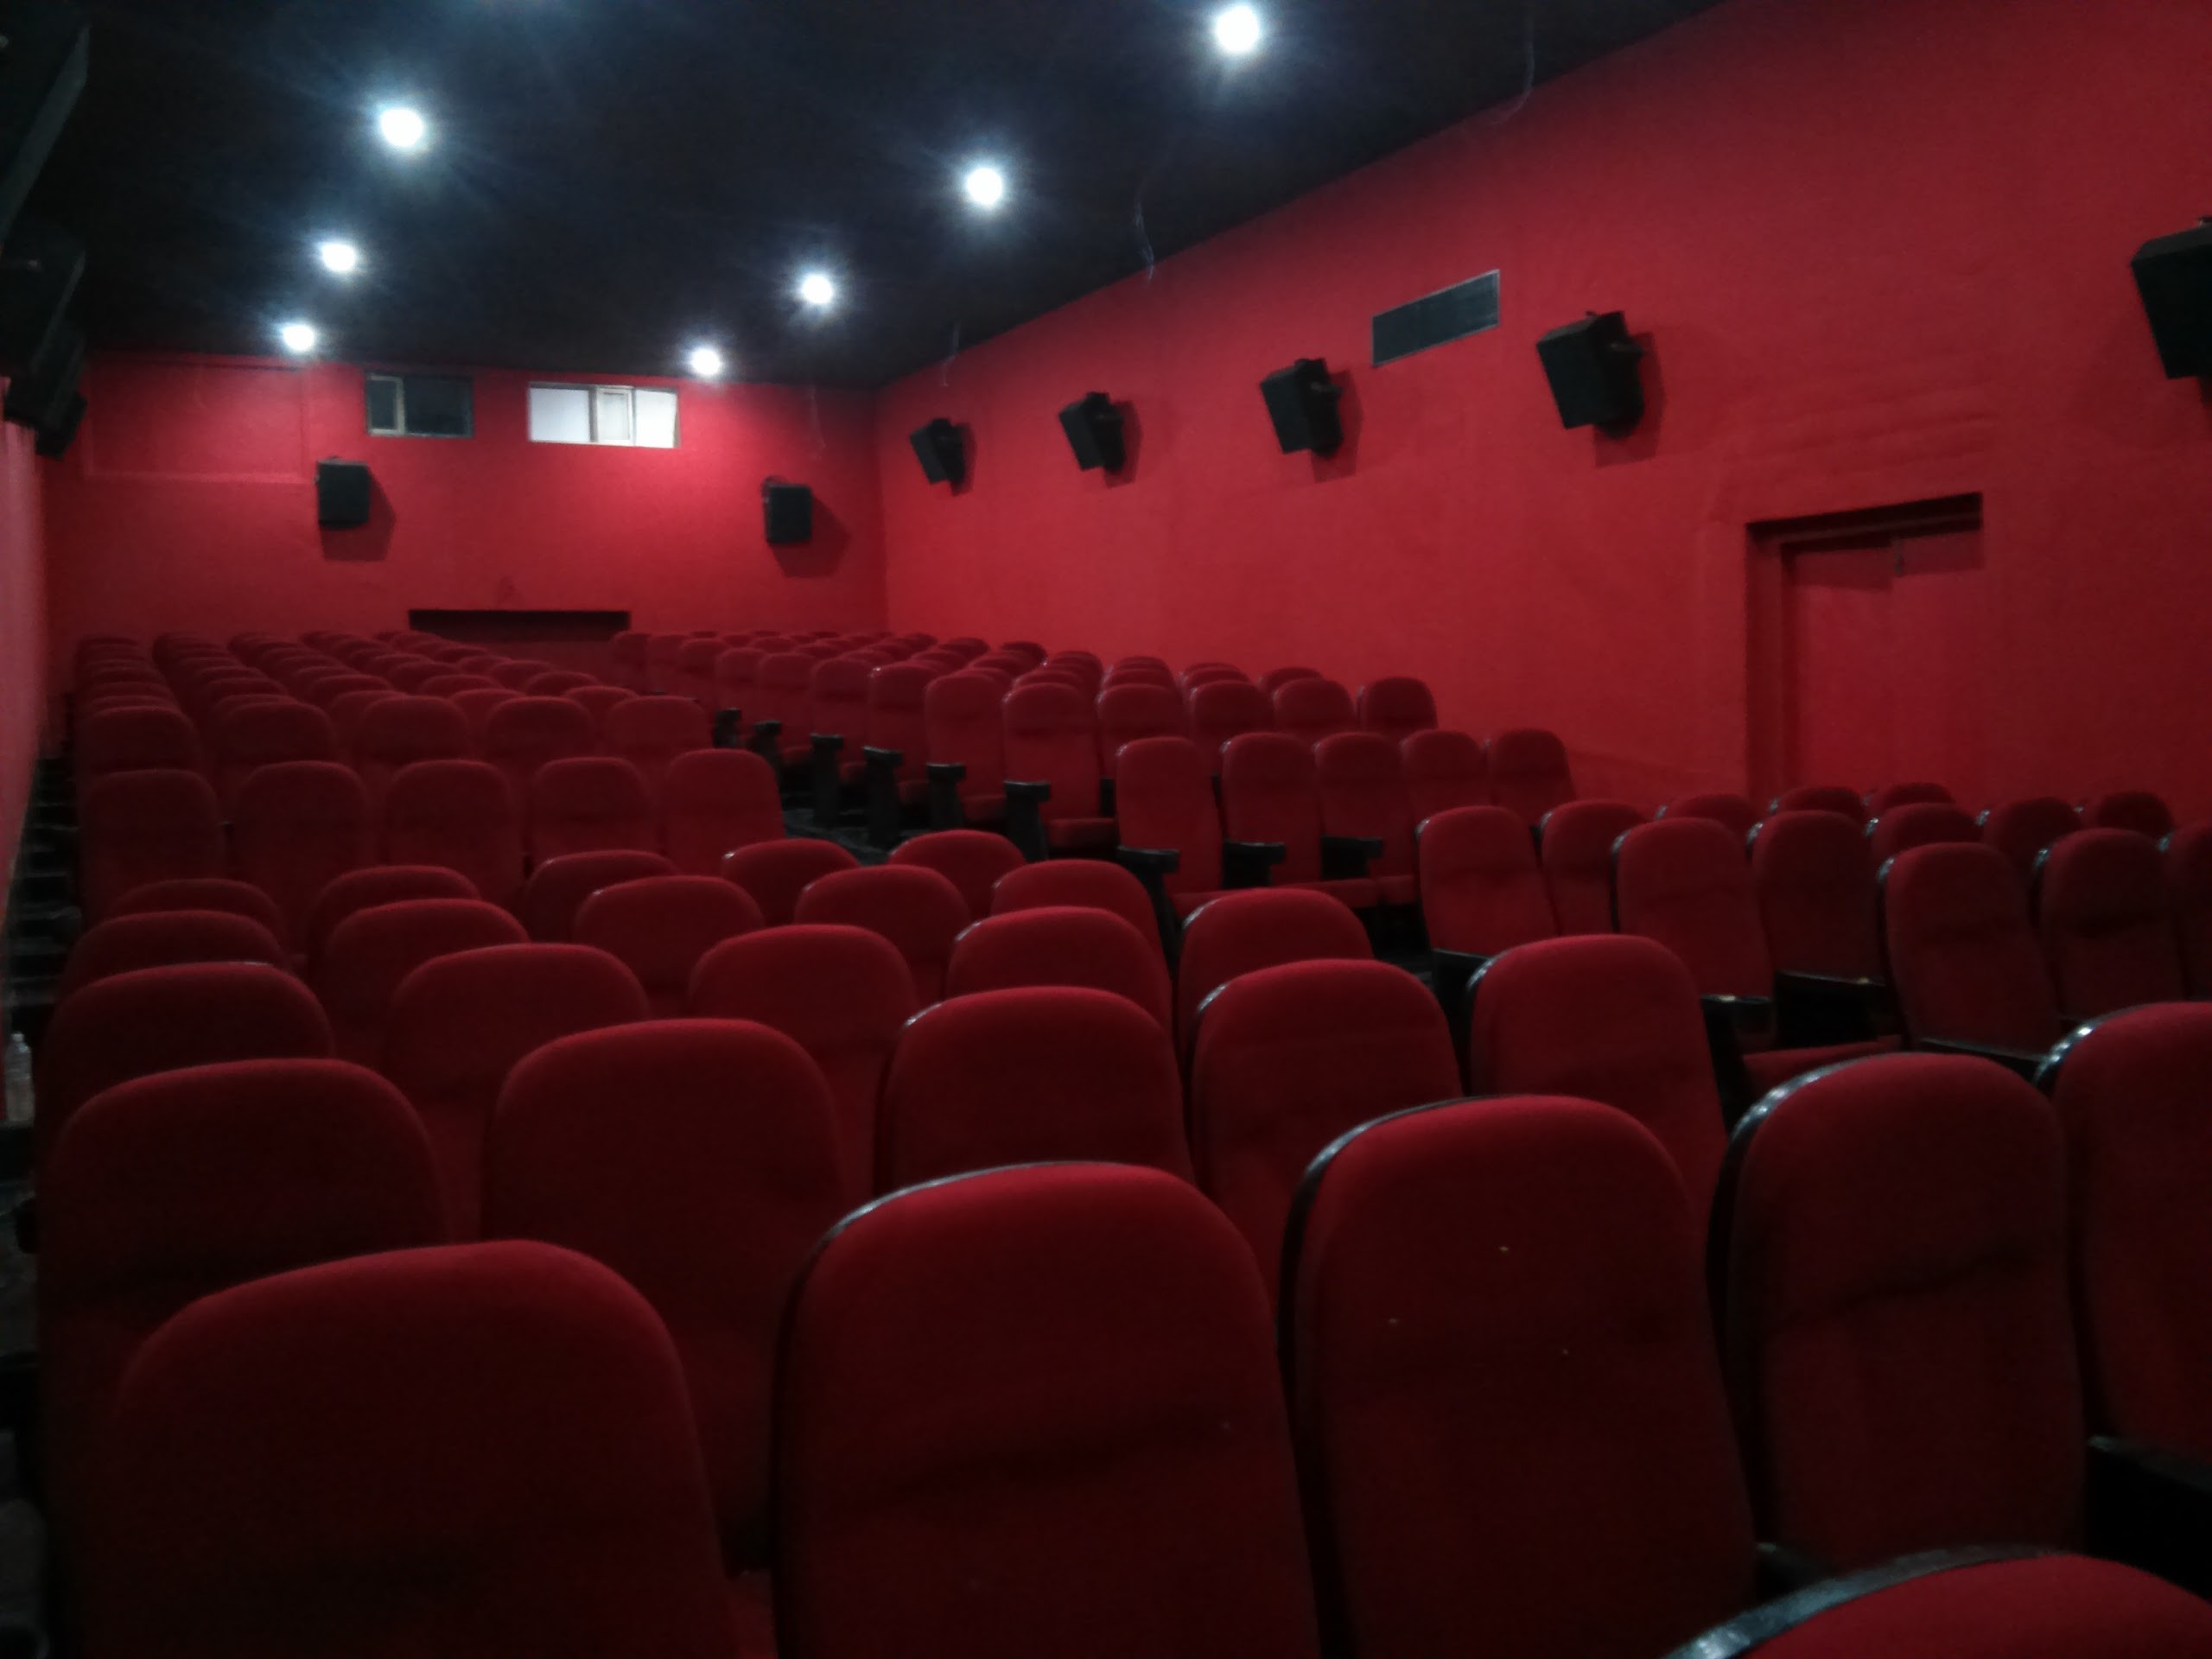 Res: 2560x1920, SK-Marlen Cinemas - Guindy - Chennai Image